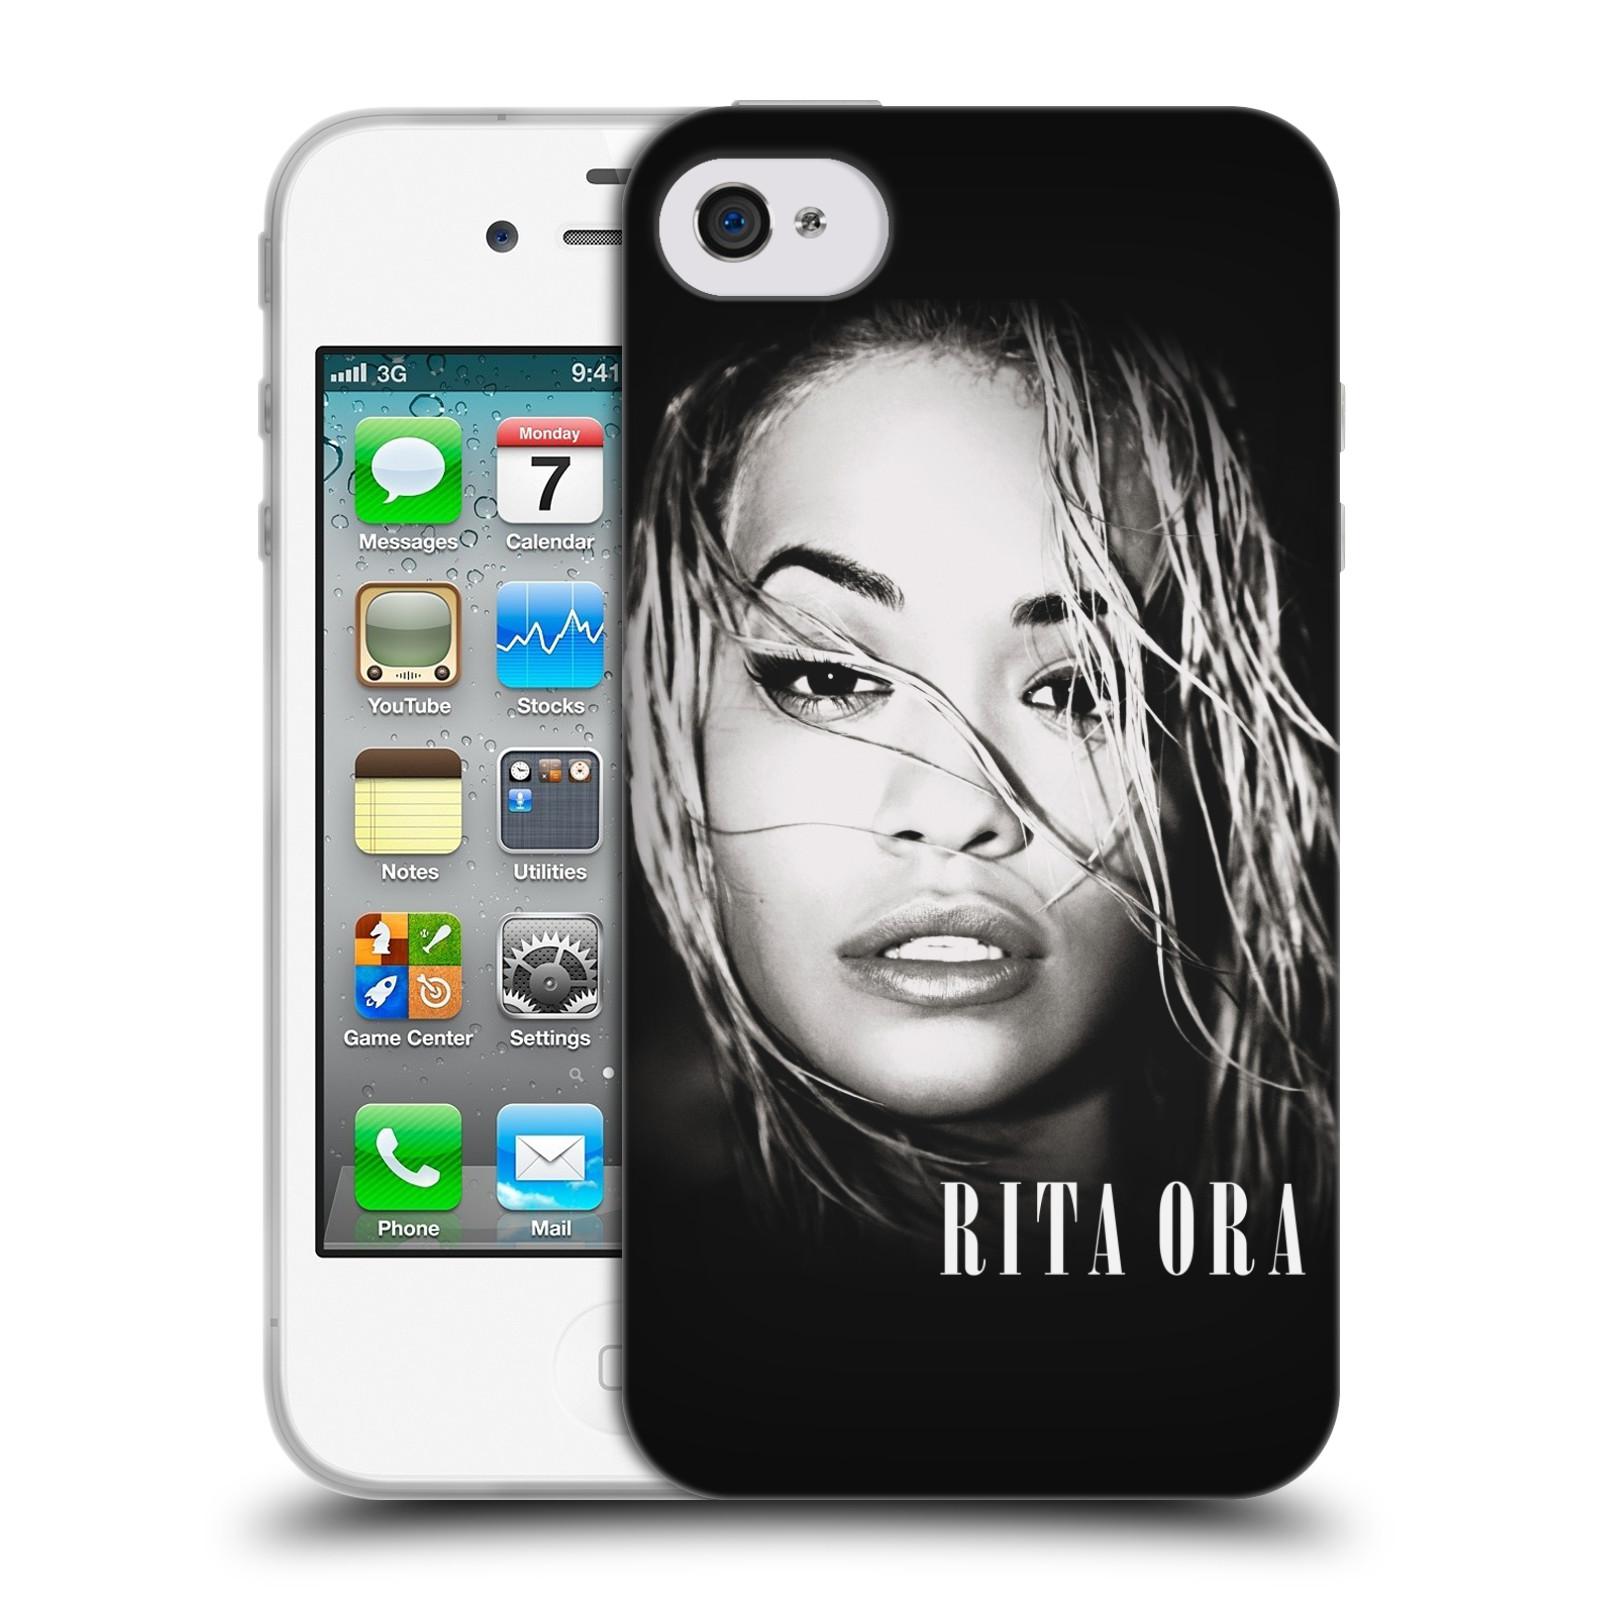 HEAD CASE silikonový obal na mobil Apple Iphone 4/4S zpěvačka Rita Ora foto tvář